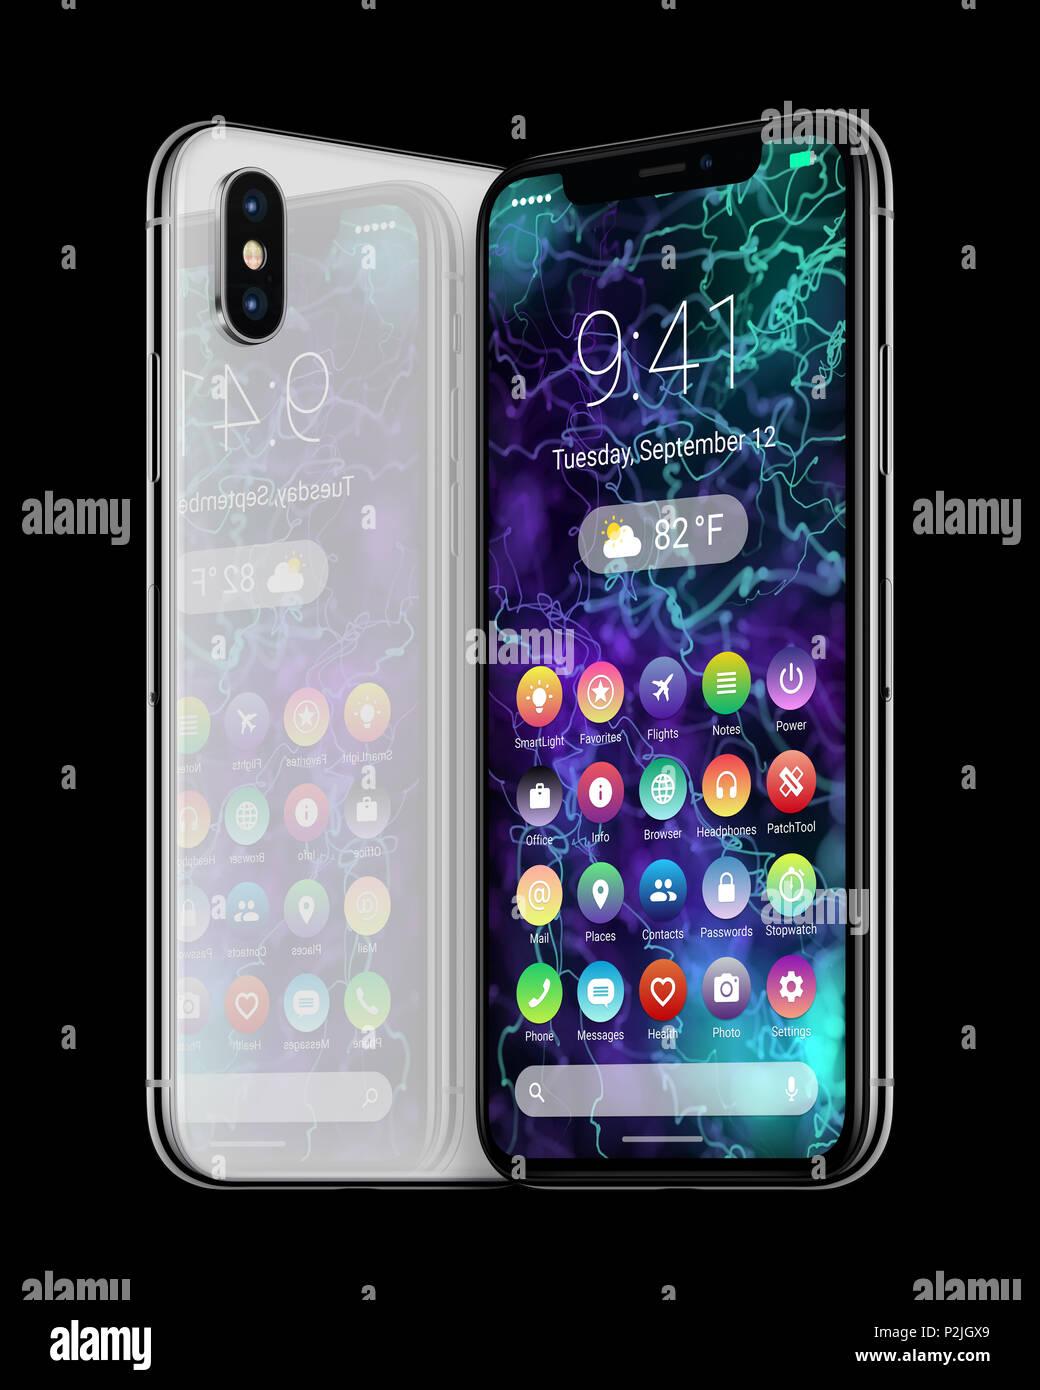 Gira los smartphones con material blanco plana de diseño de interfaz de usuario. Android teléfono concepto. Foto de stock